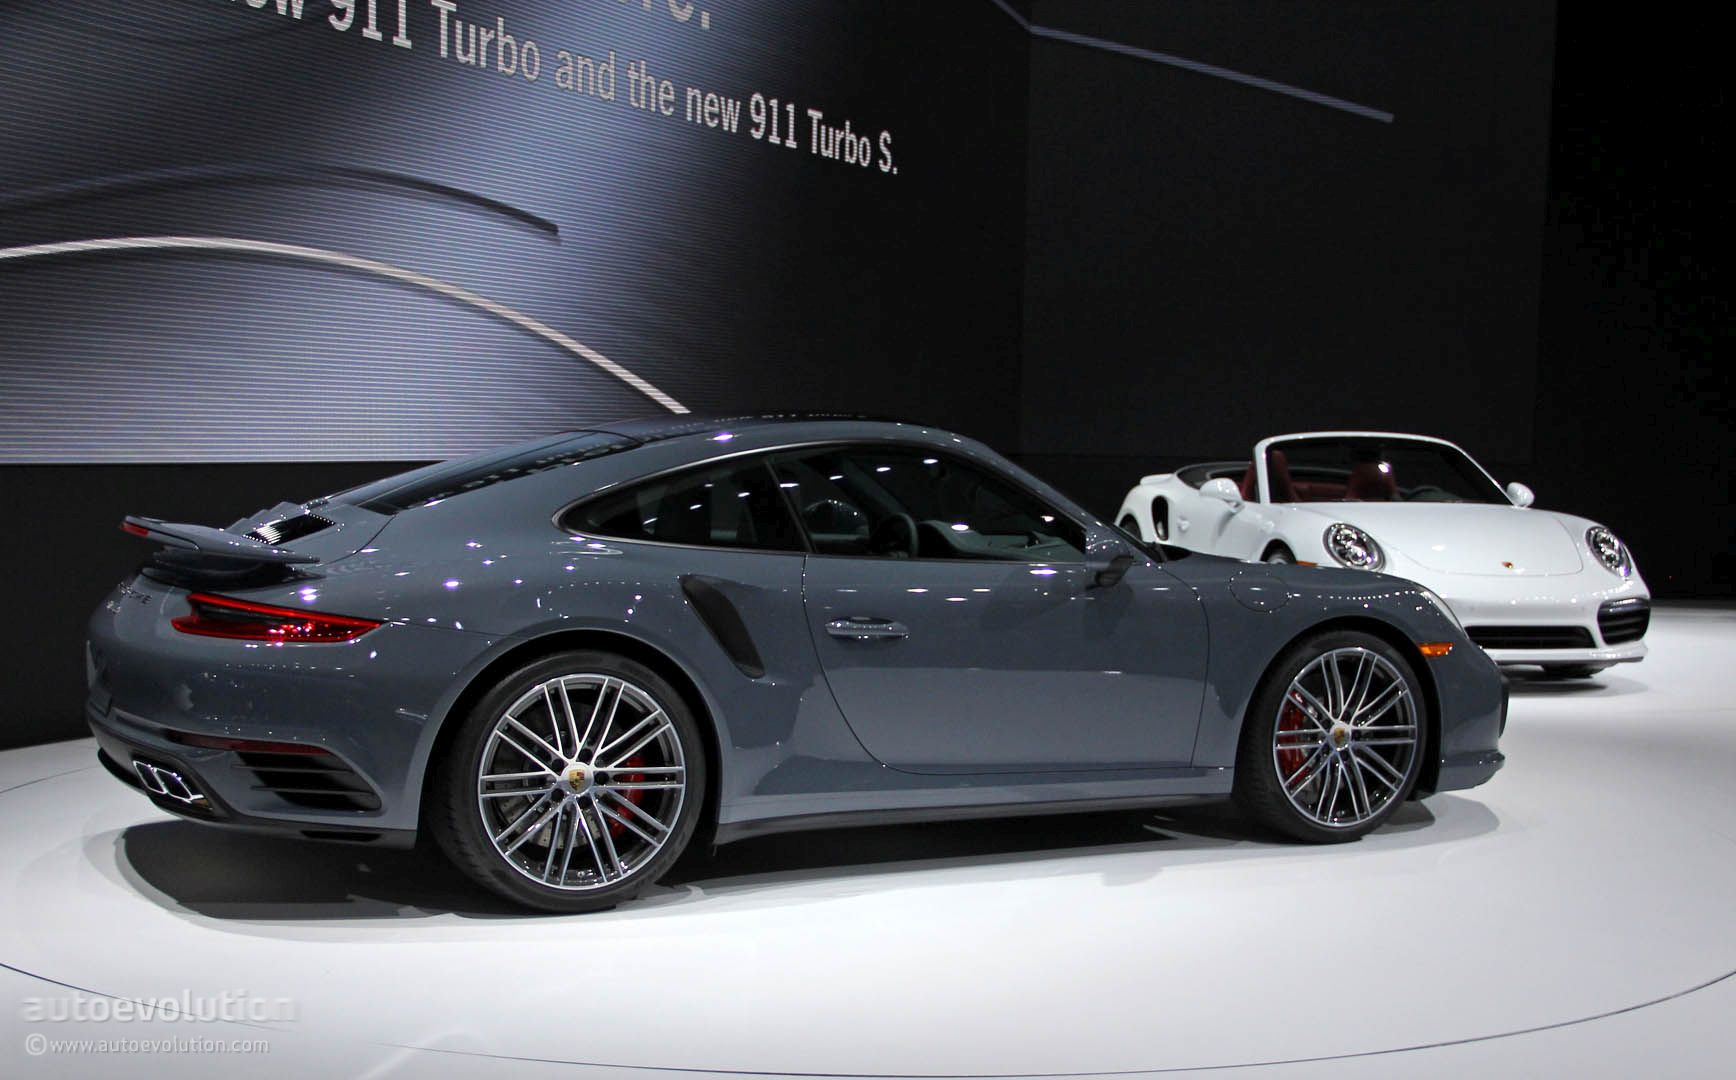 2017 porsche 911 turbo turbo s bring their anti lag tech wizardry to detroit autoevolution. Black Bedroom Furniture Sets. Home Design Ideas